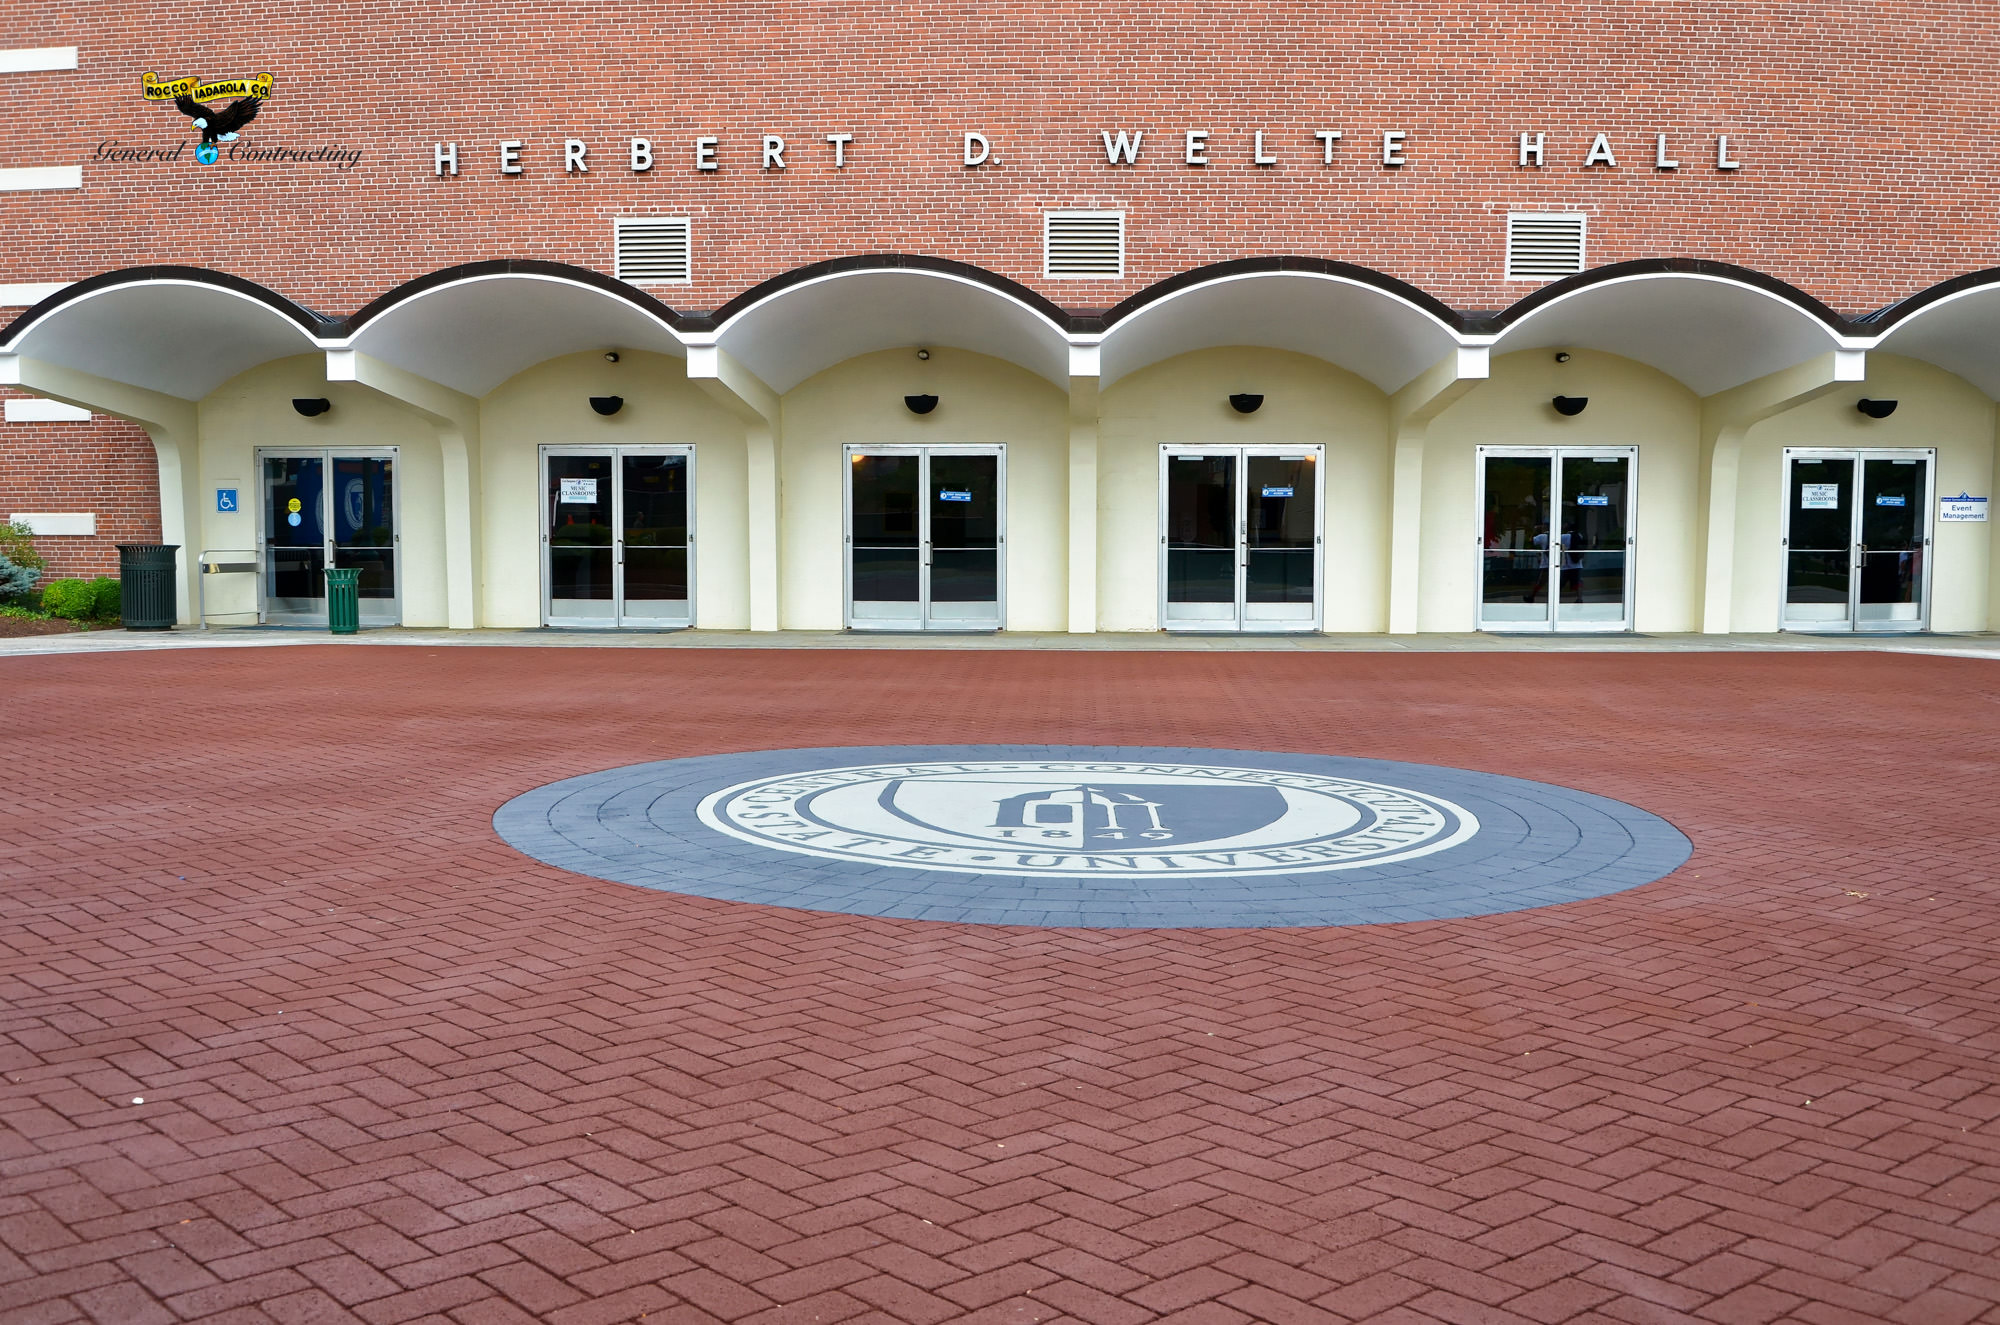 Herbert Welte Hall CCSU Central Connecticut State University Rocco Iadarola Asphalting-108.jpg